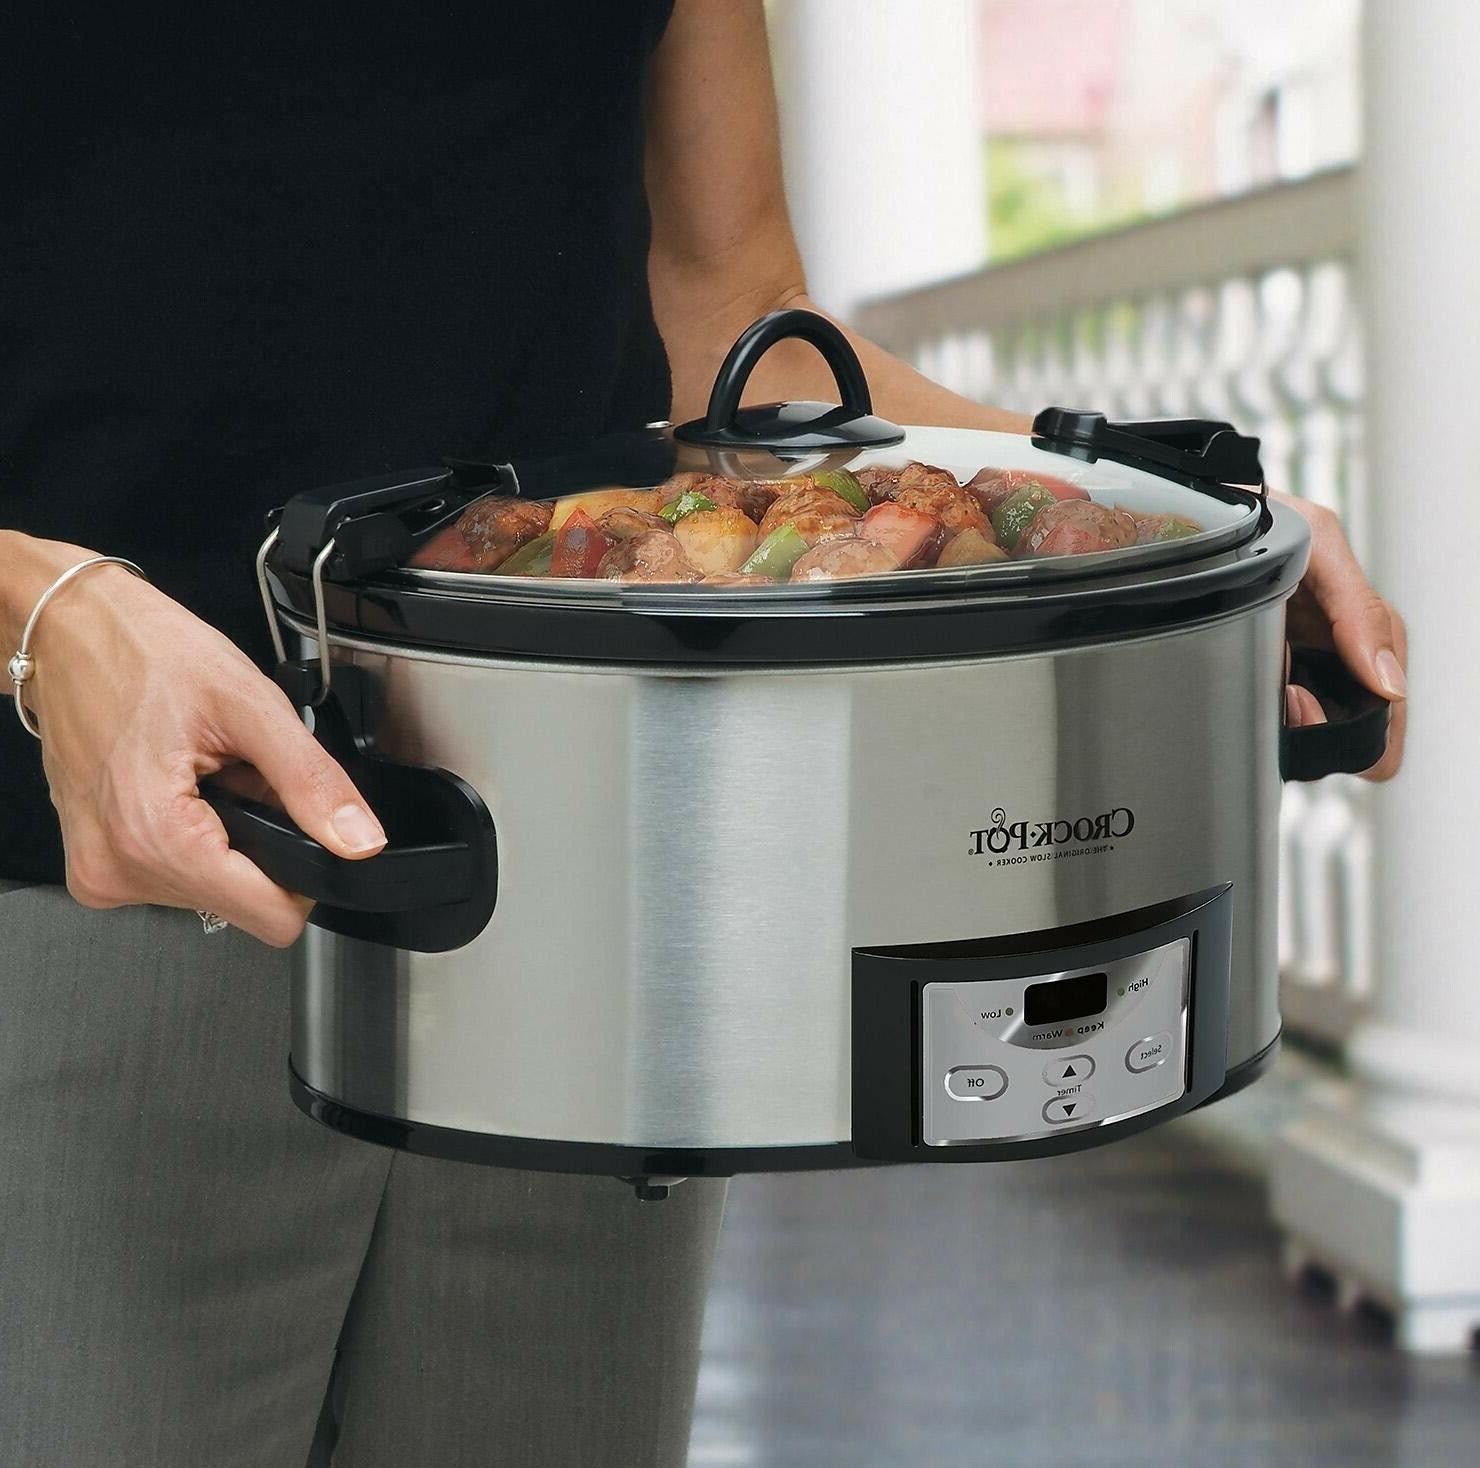 Crock-Pot Programmable Cook & Carry Slow Cooker